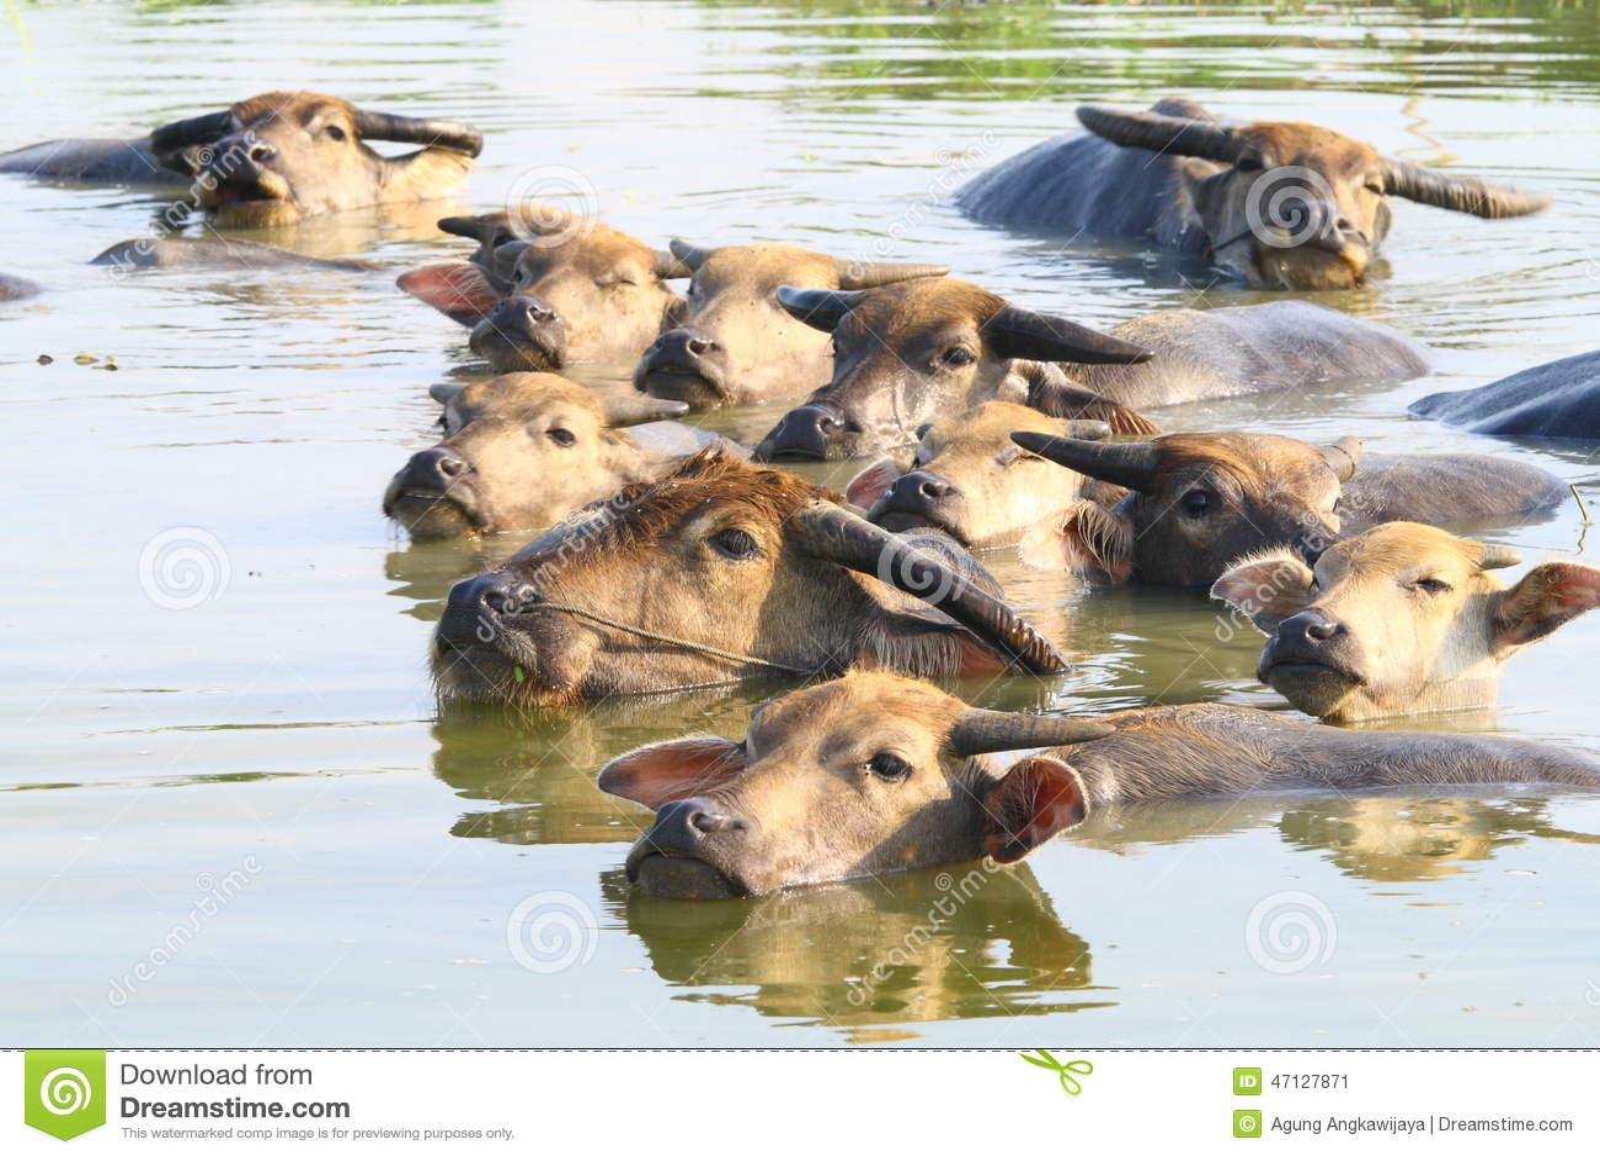 Swimming Water Buffaloes